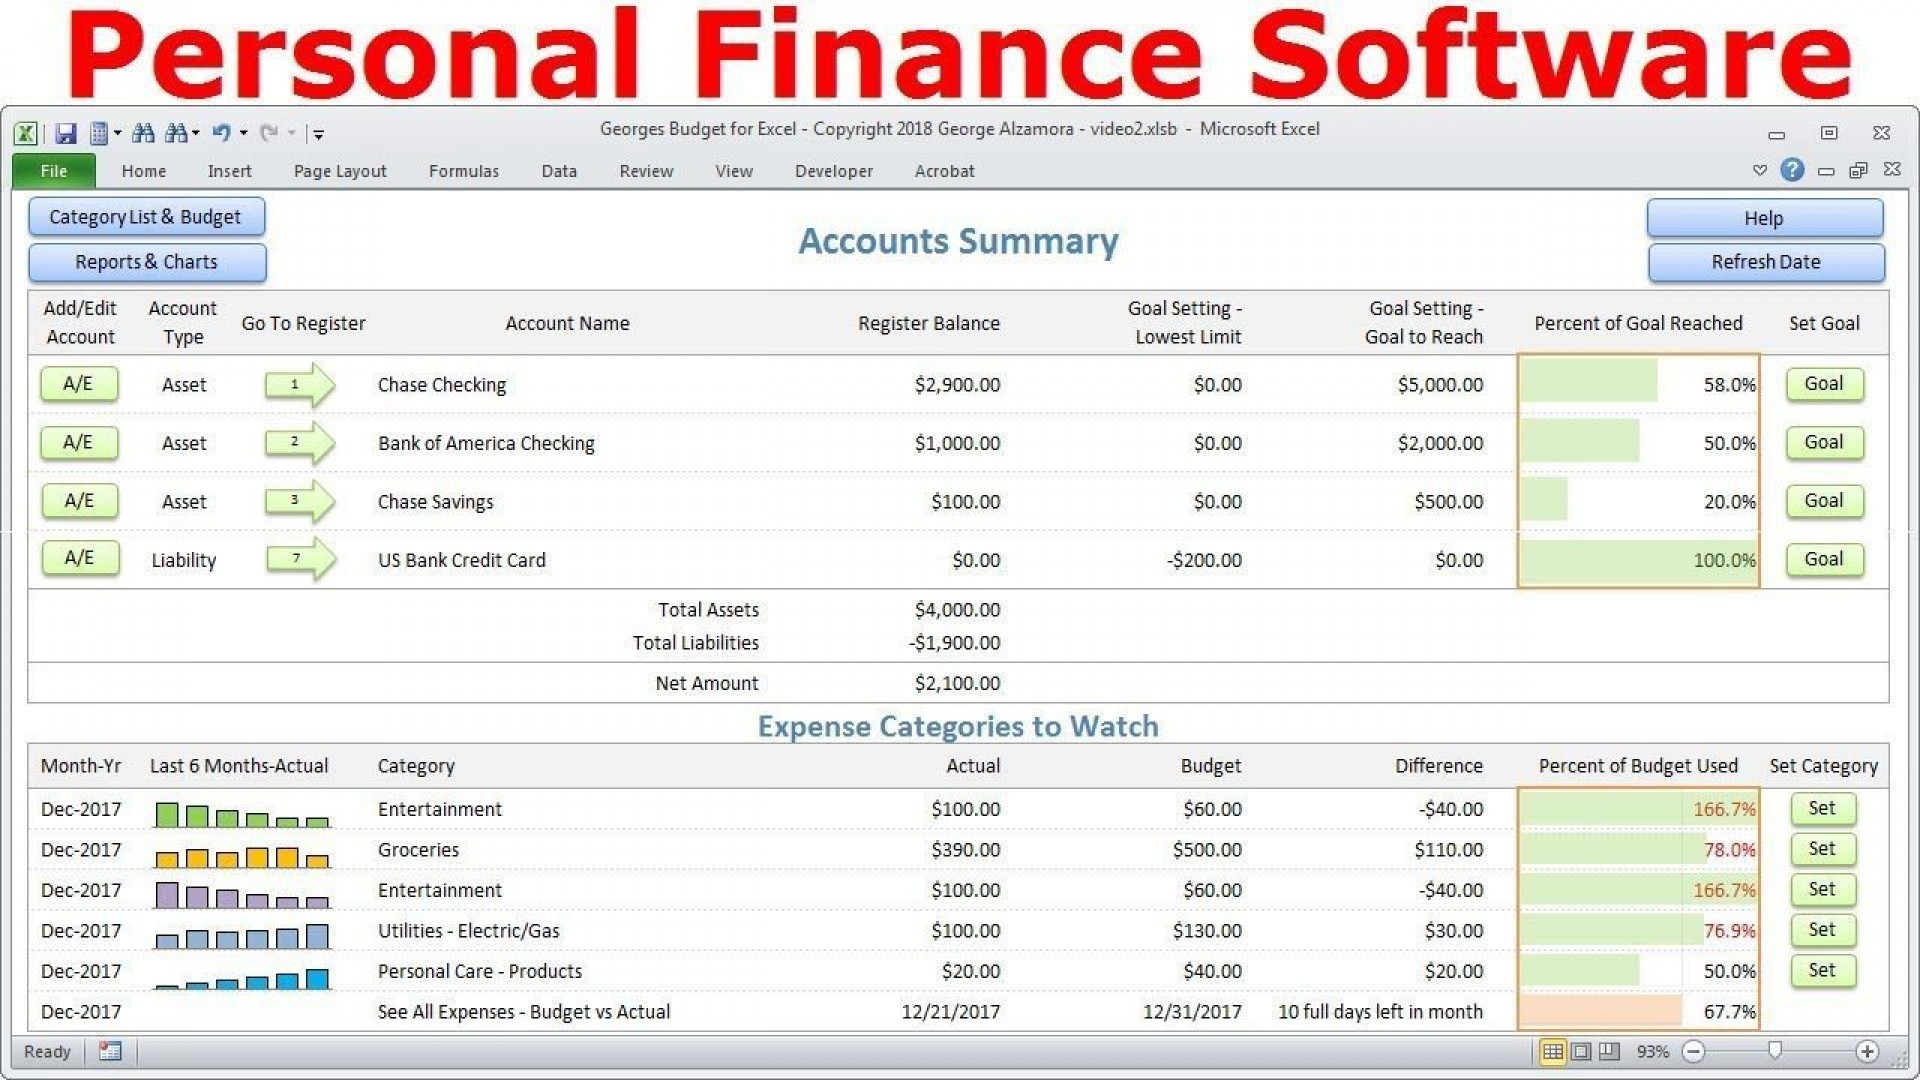 001 Unusual Personal Spending Excel Template Design  Best Budget Planner Free Finance1920